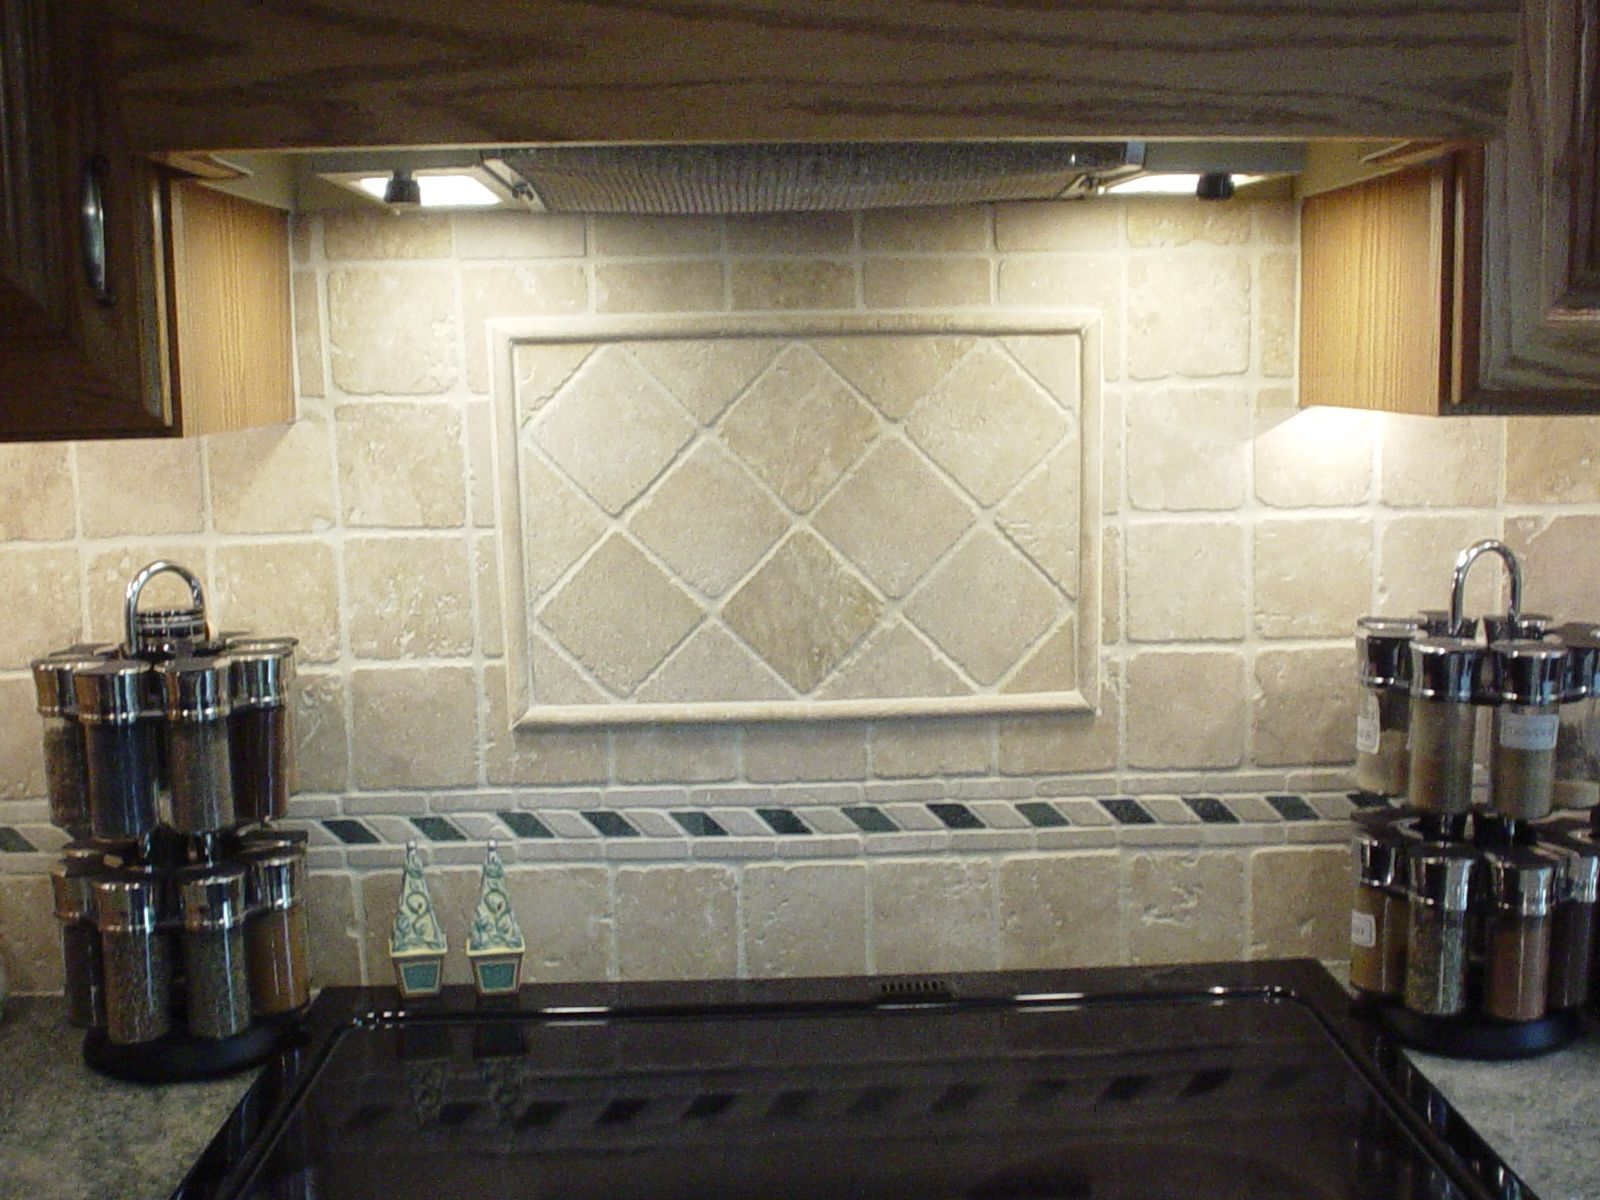 tumbled stone kitchen backsplash. Granite Counter Tops With Tumbled Marble Backsplash Metal Decos! Check Out Our Selection! Http://jptilewholesalers.com/Natural-Stone-Tile_c4.h\u2026 Stone Kitchen N